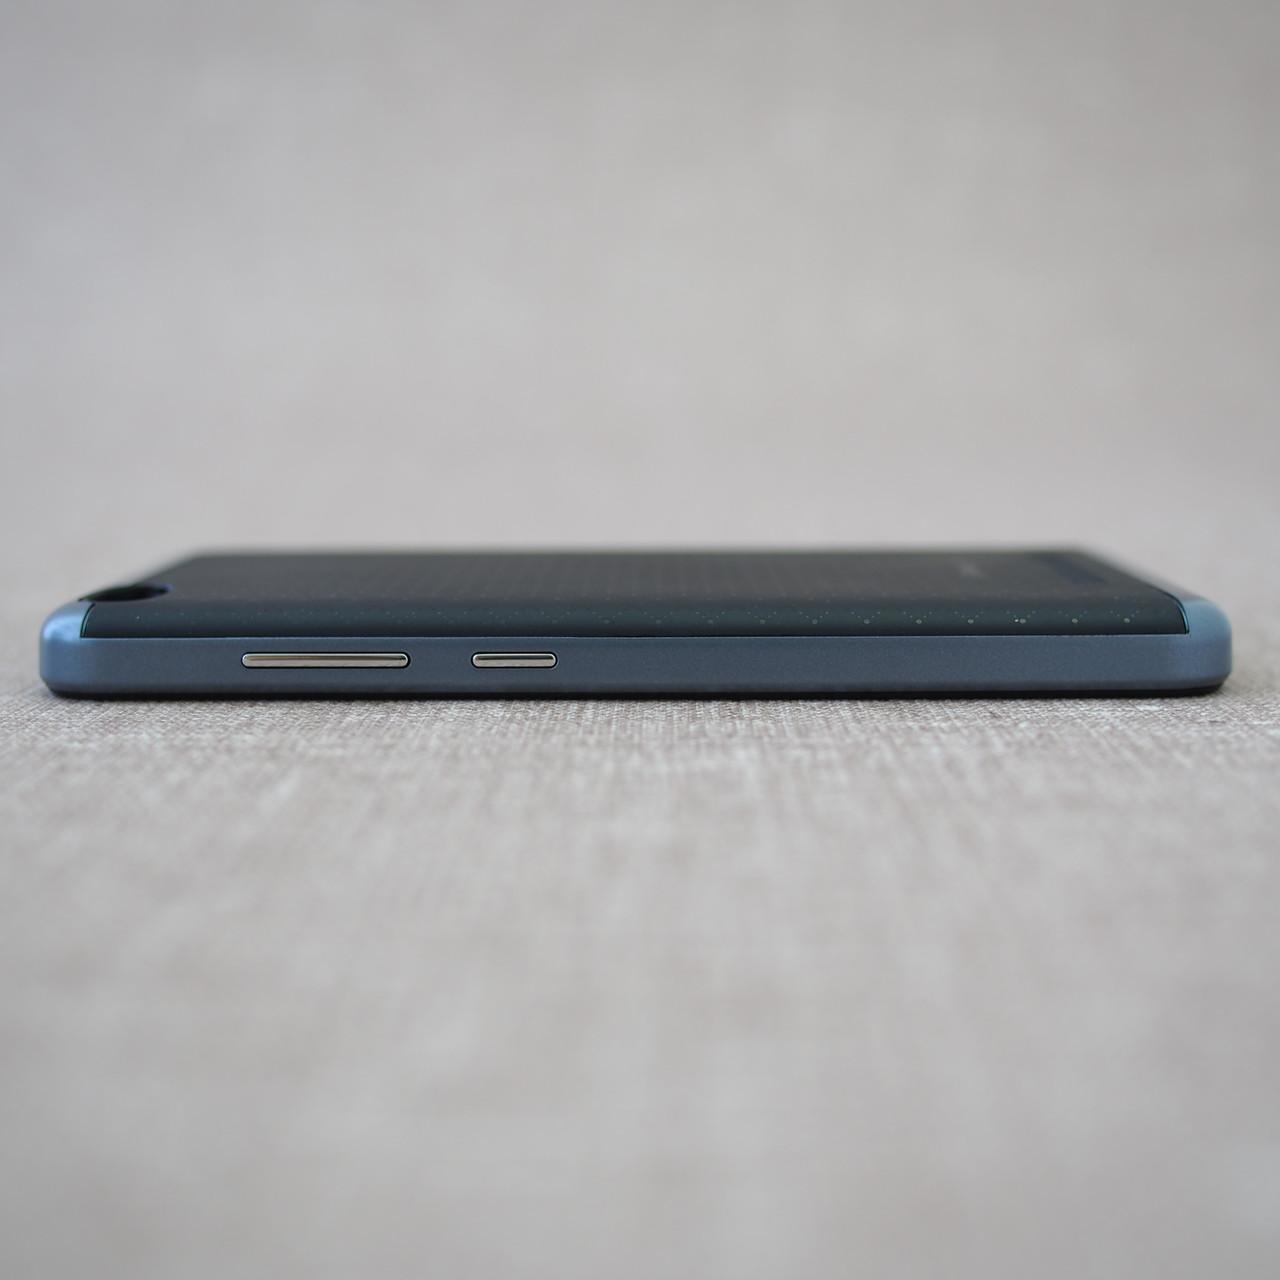 Чехол iPaky Xiaomi Redmi 4a grey 4A Для телефона